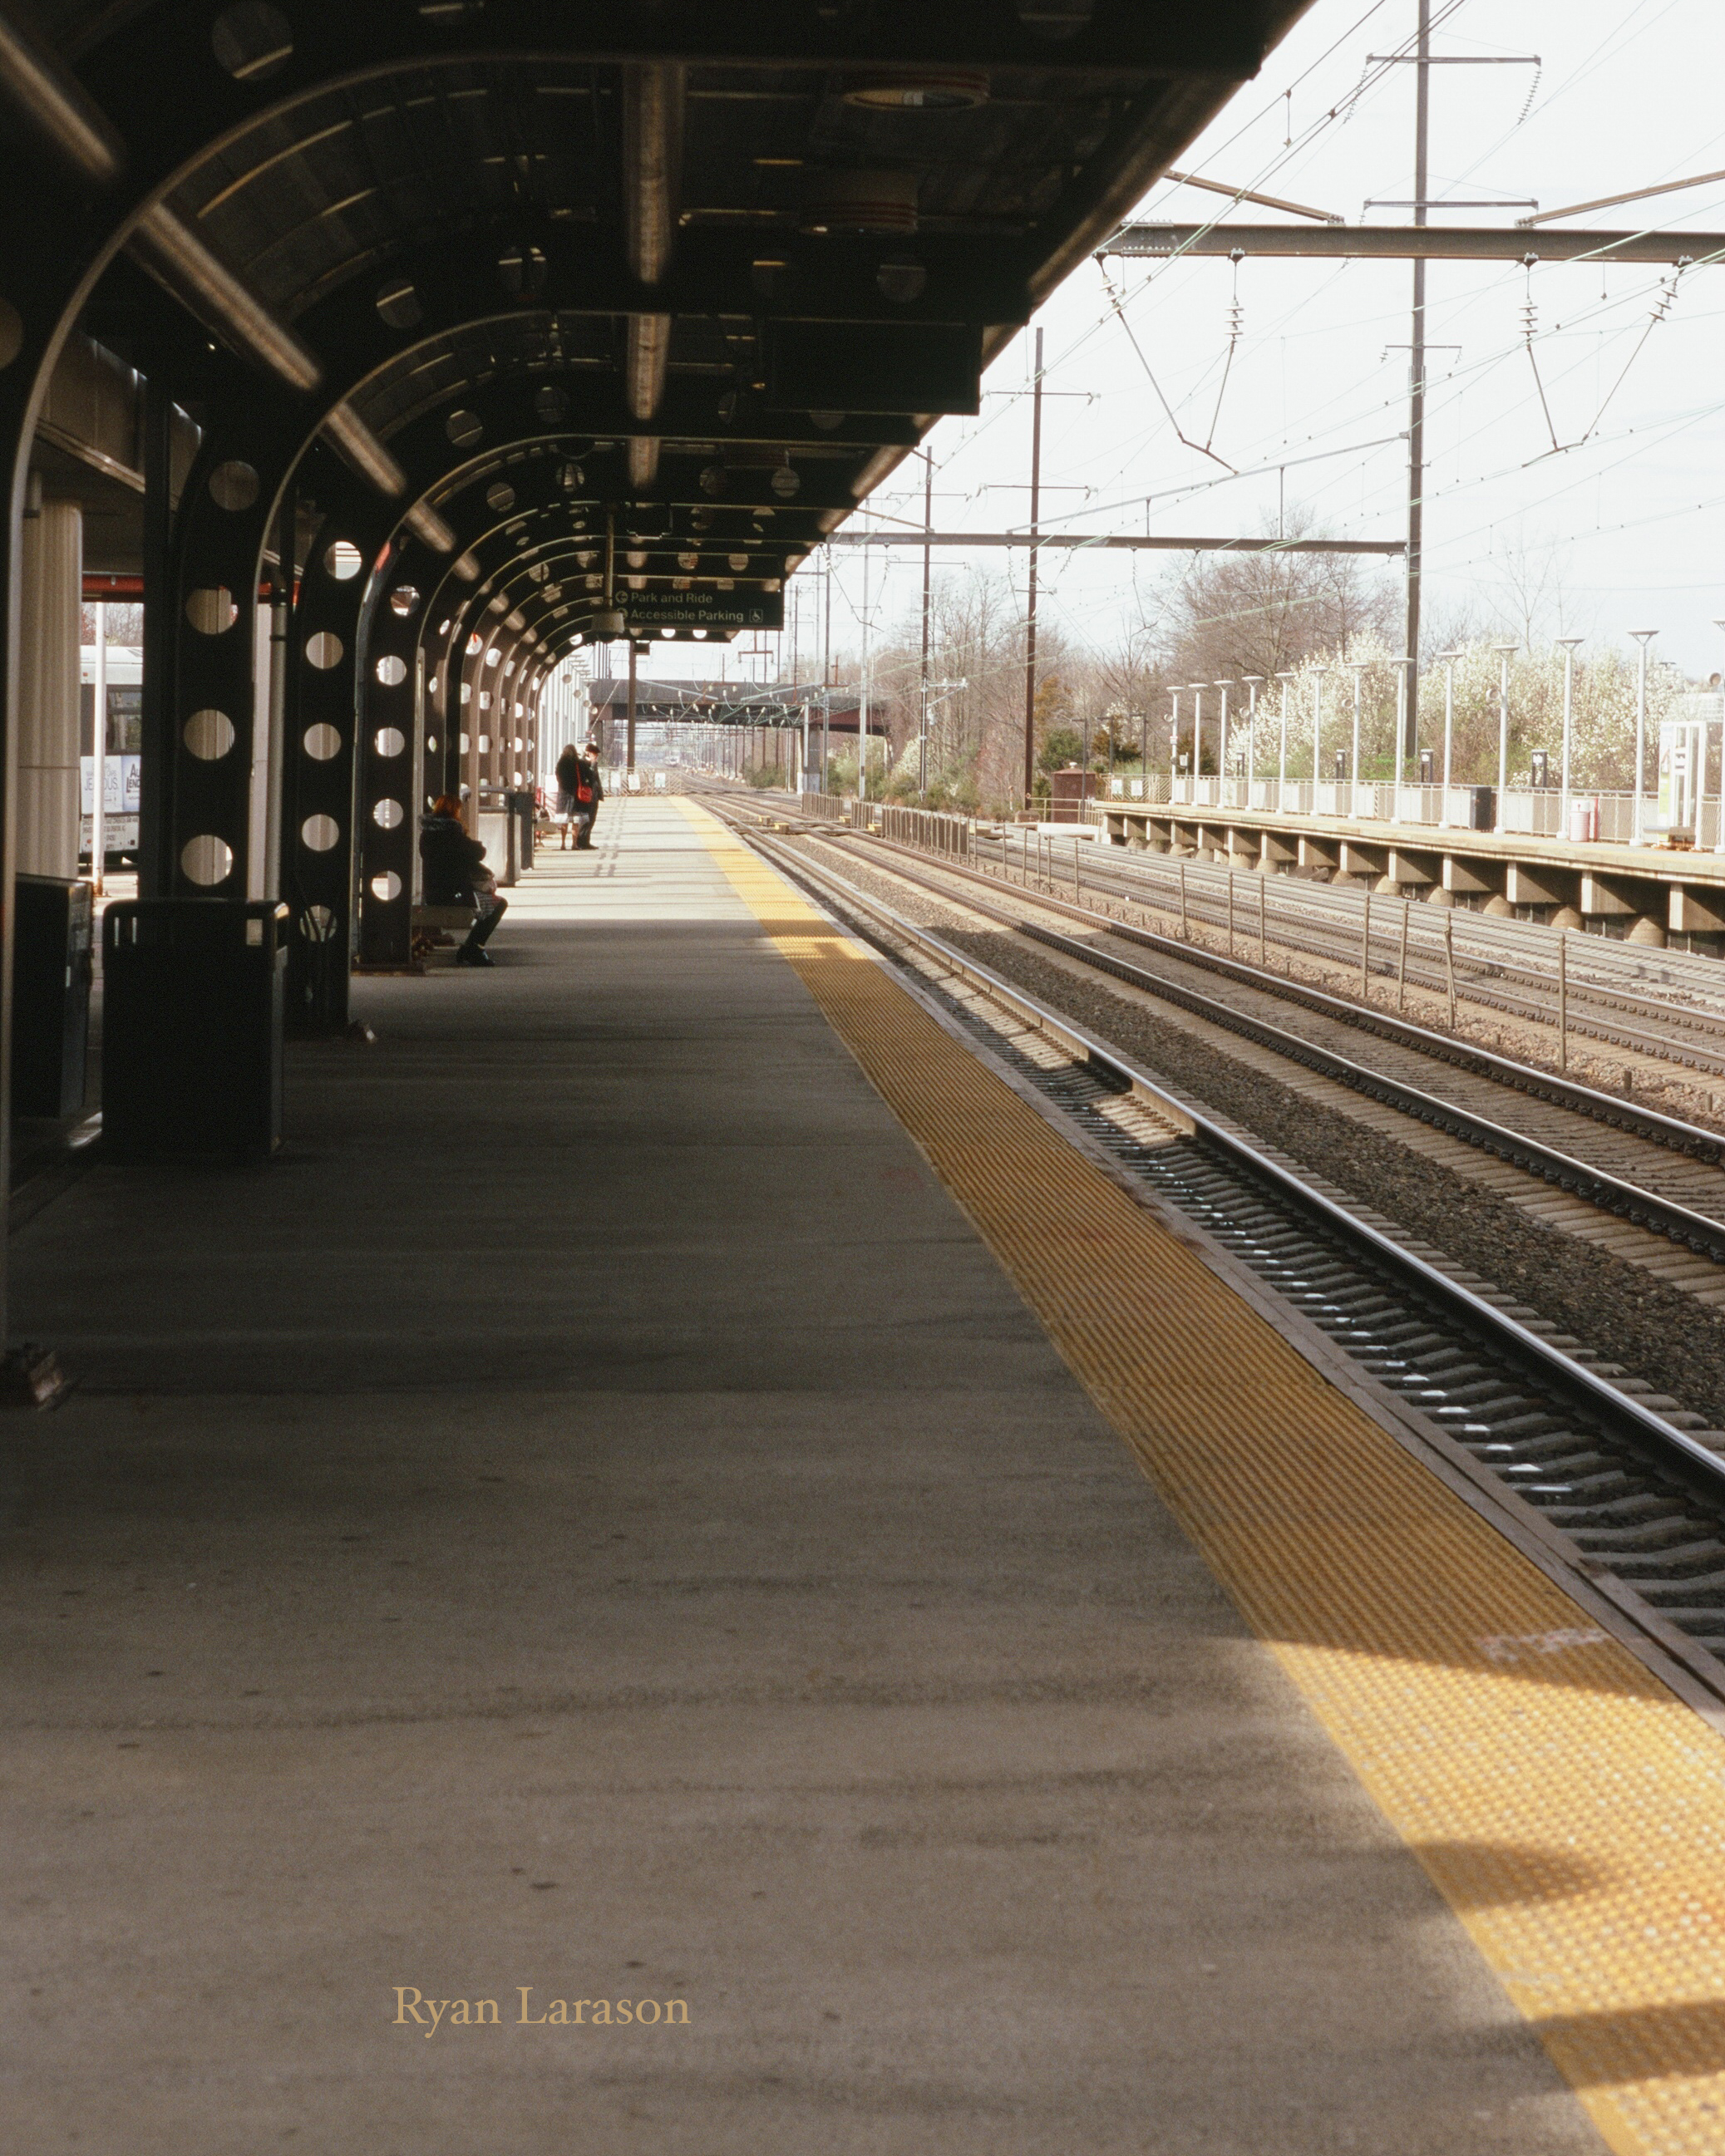 Empty Platform_8x10_WM.jpg